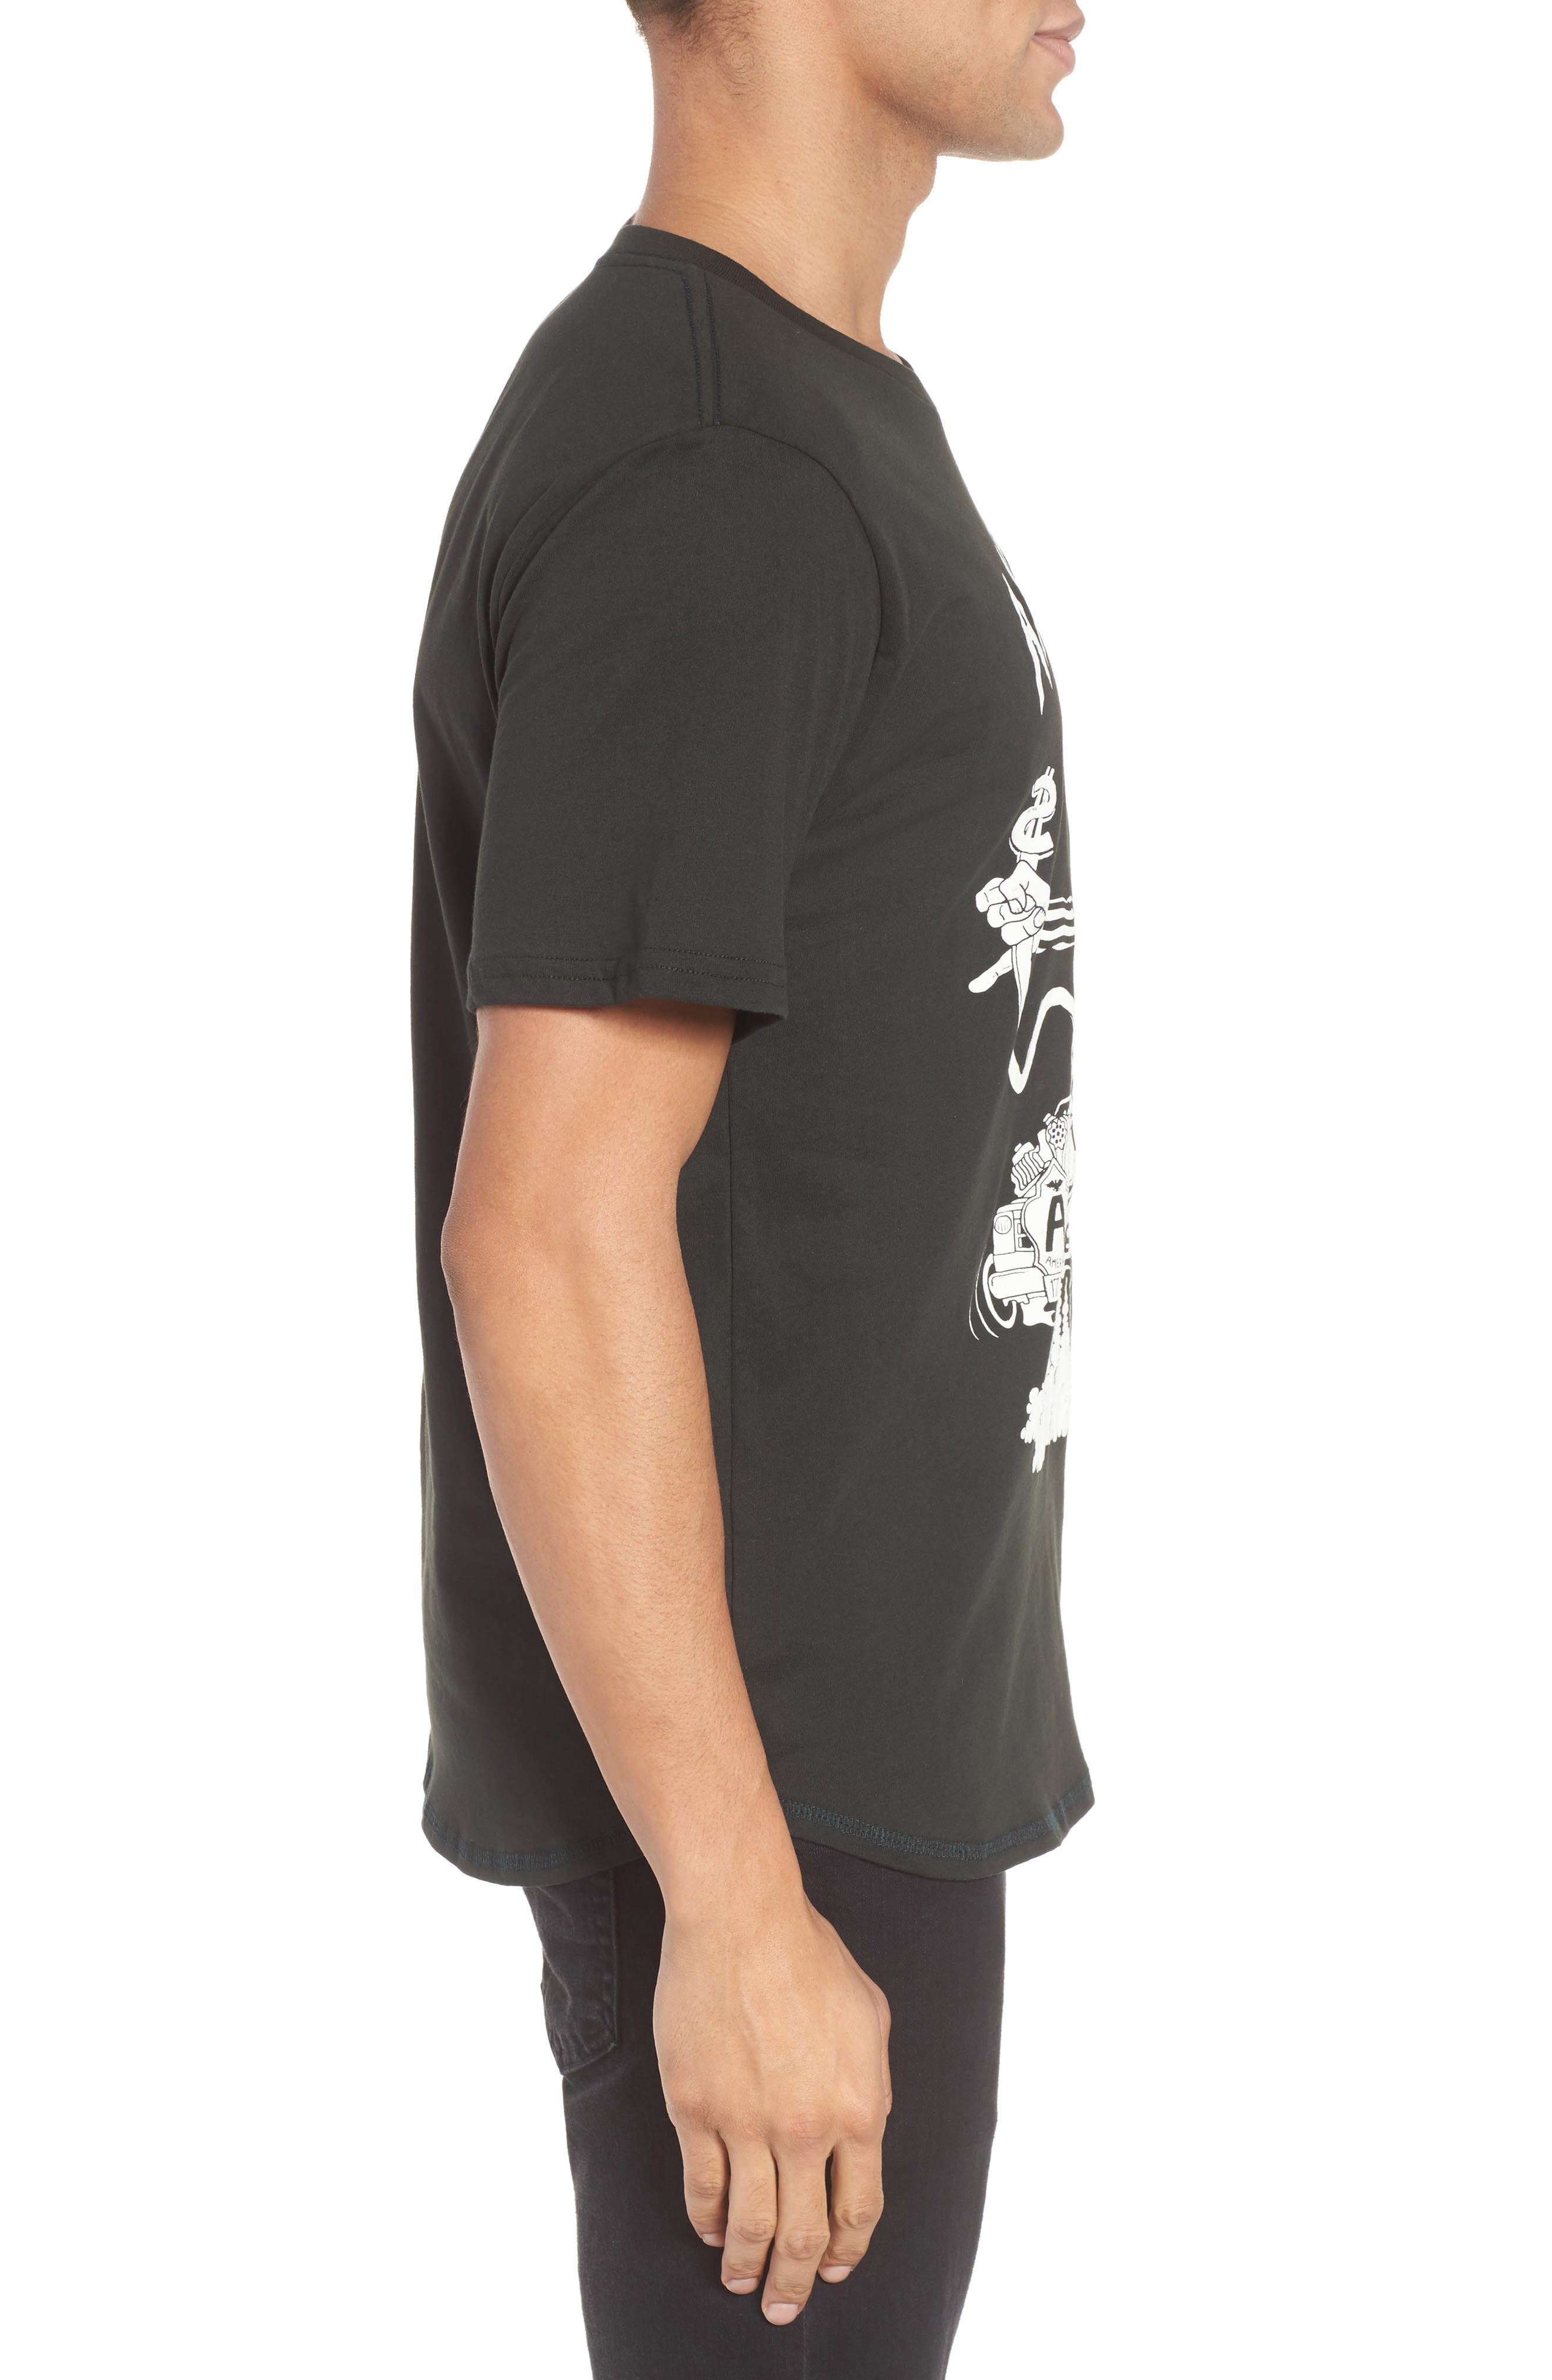 BARKING IRONS,                             Engine Americus Graphic T-Shirt,                             Alternate thumbnail 3, color,                             001